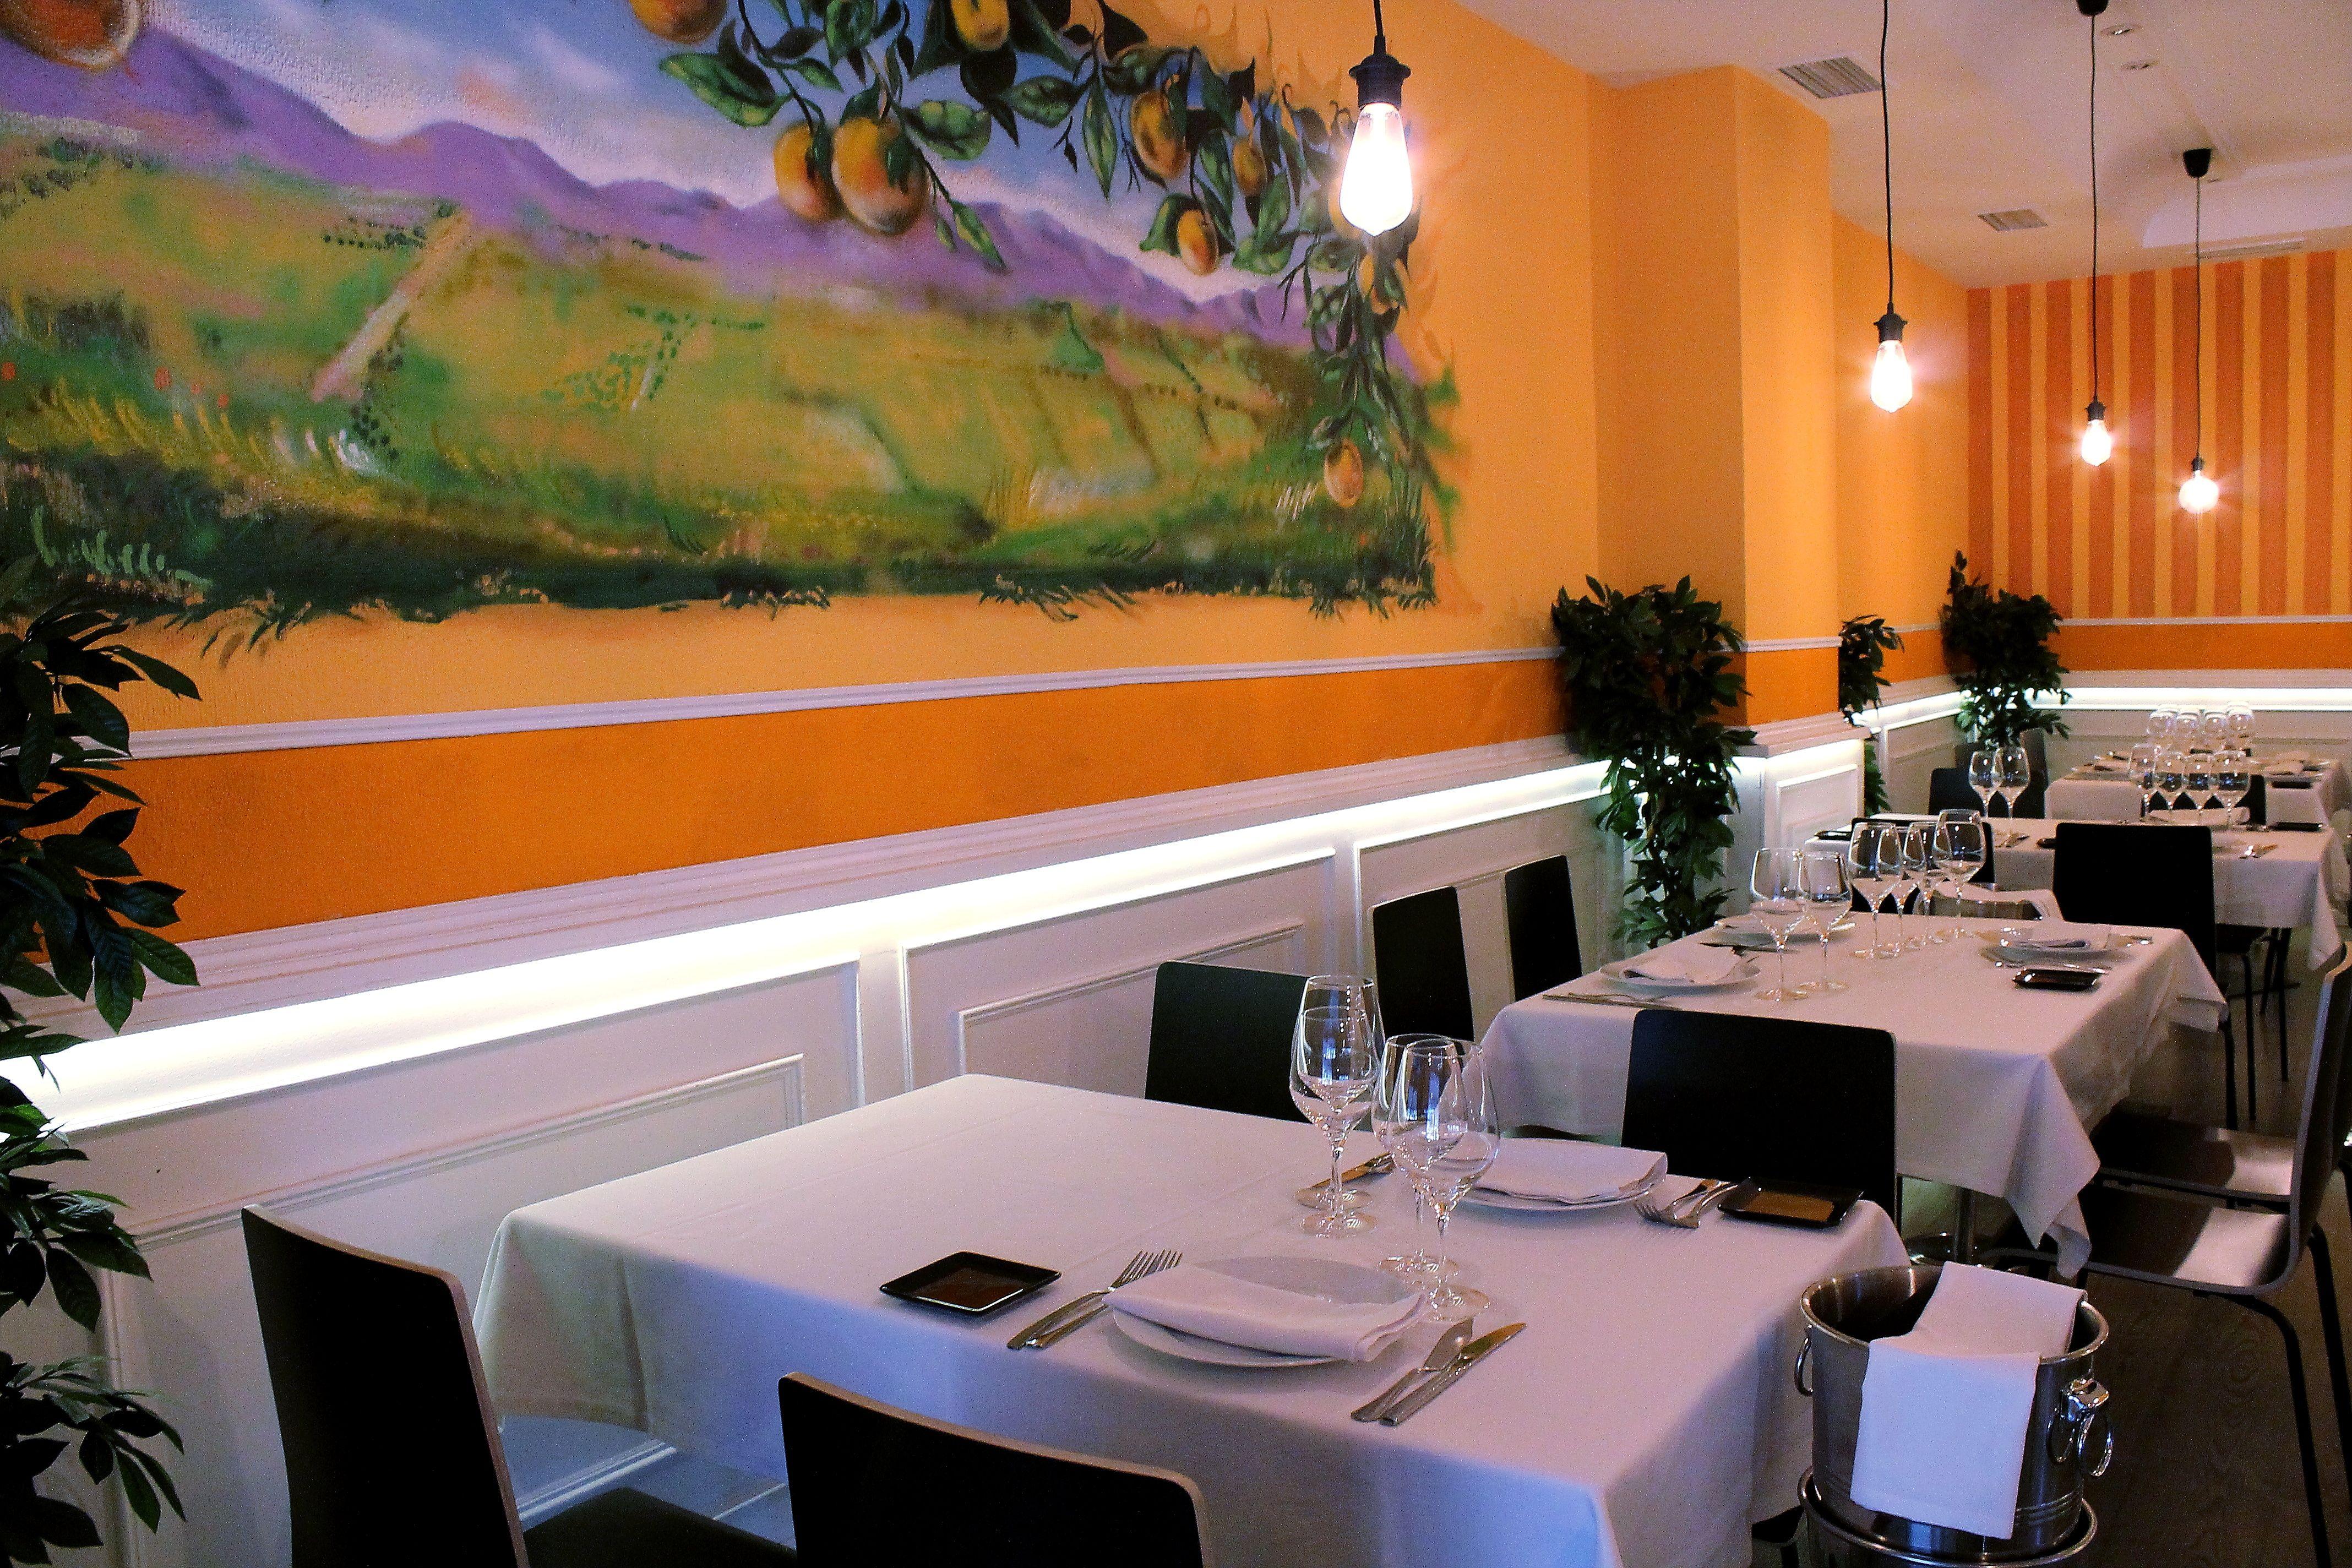 Restaurante para comer arroz en Tetuán, Madrid